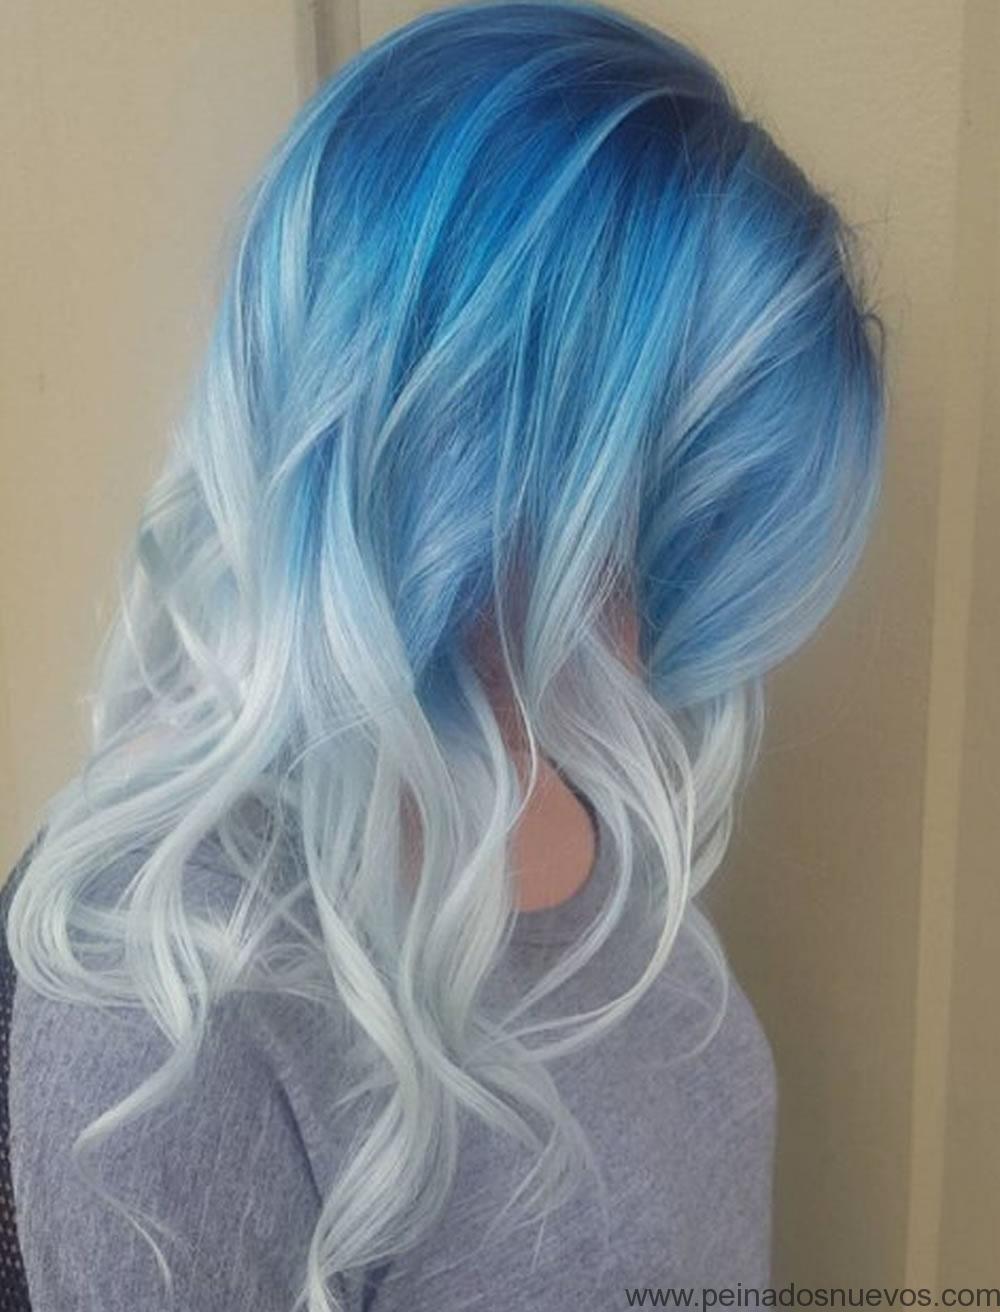 Peinados cómo balayage ombre paso a paso de pelo tutorial